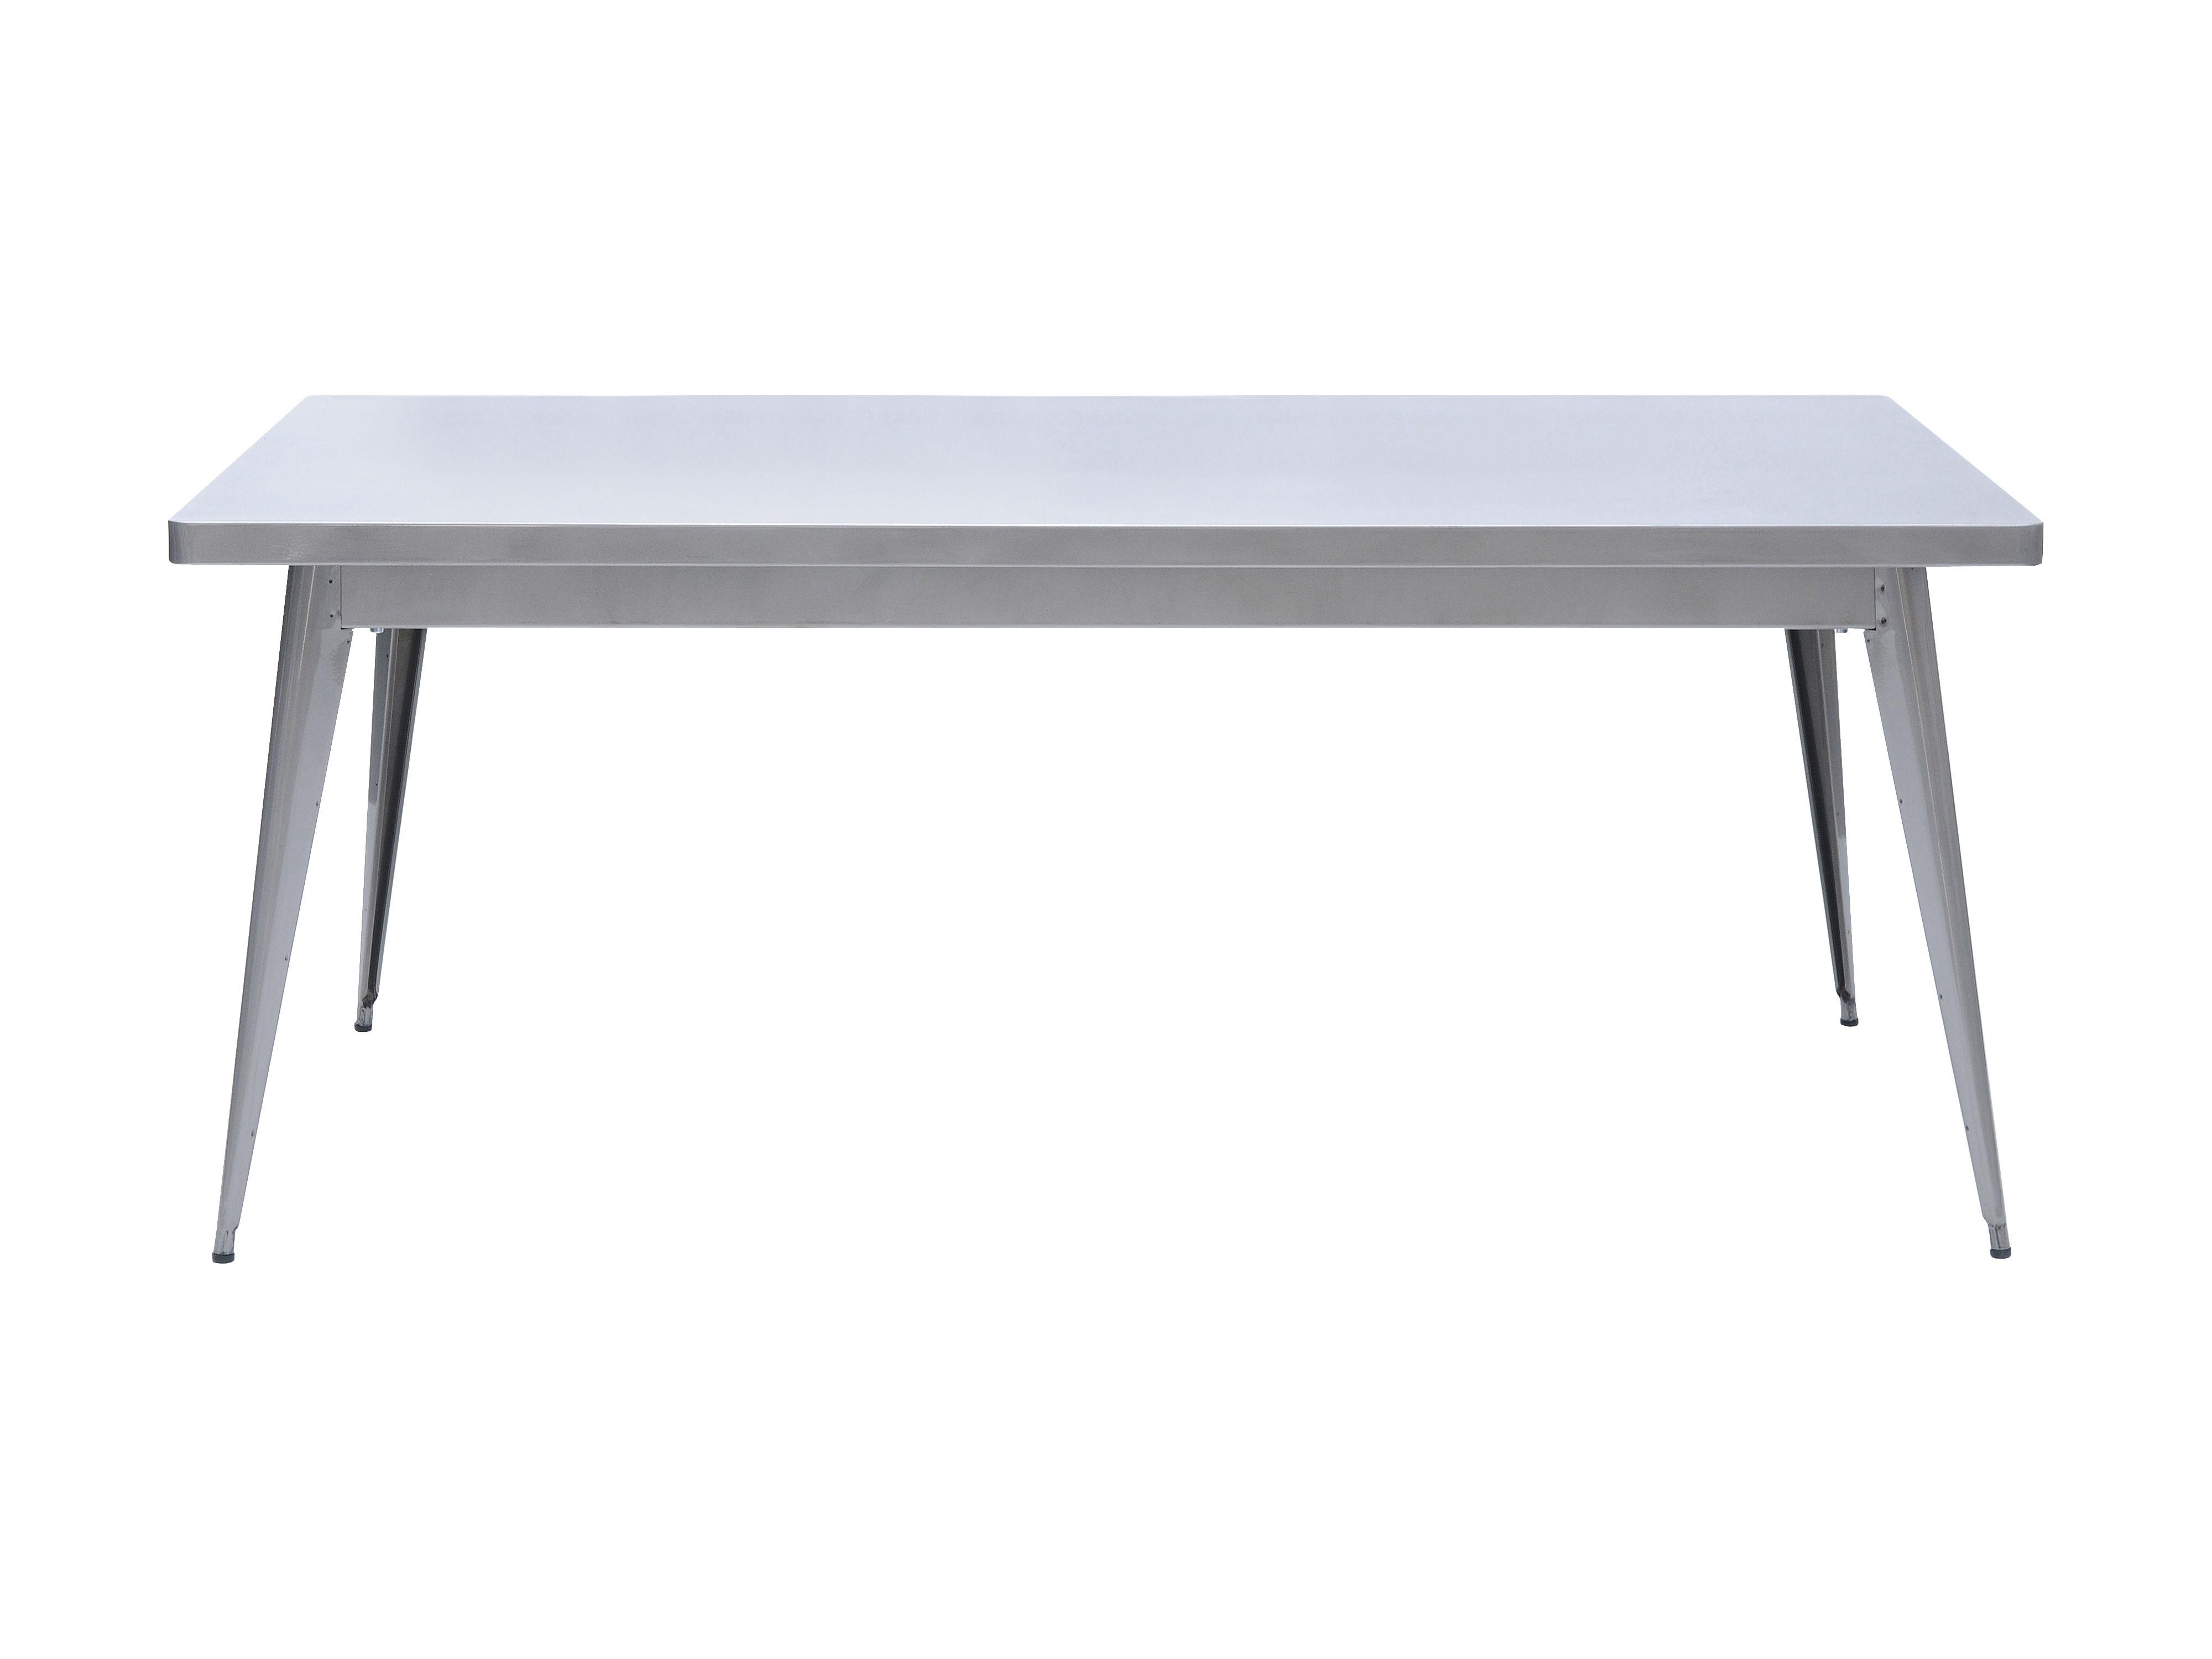 Vitrine IT - Vitrine Home IT - 55 Rectangular table - L 130 x W 70 cm by Tolix - 130 x 70 cm - Raw glossy varnished - Gloss varnish raw steel